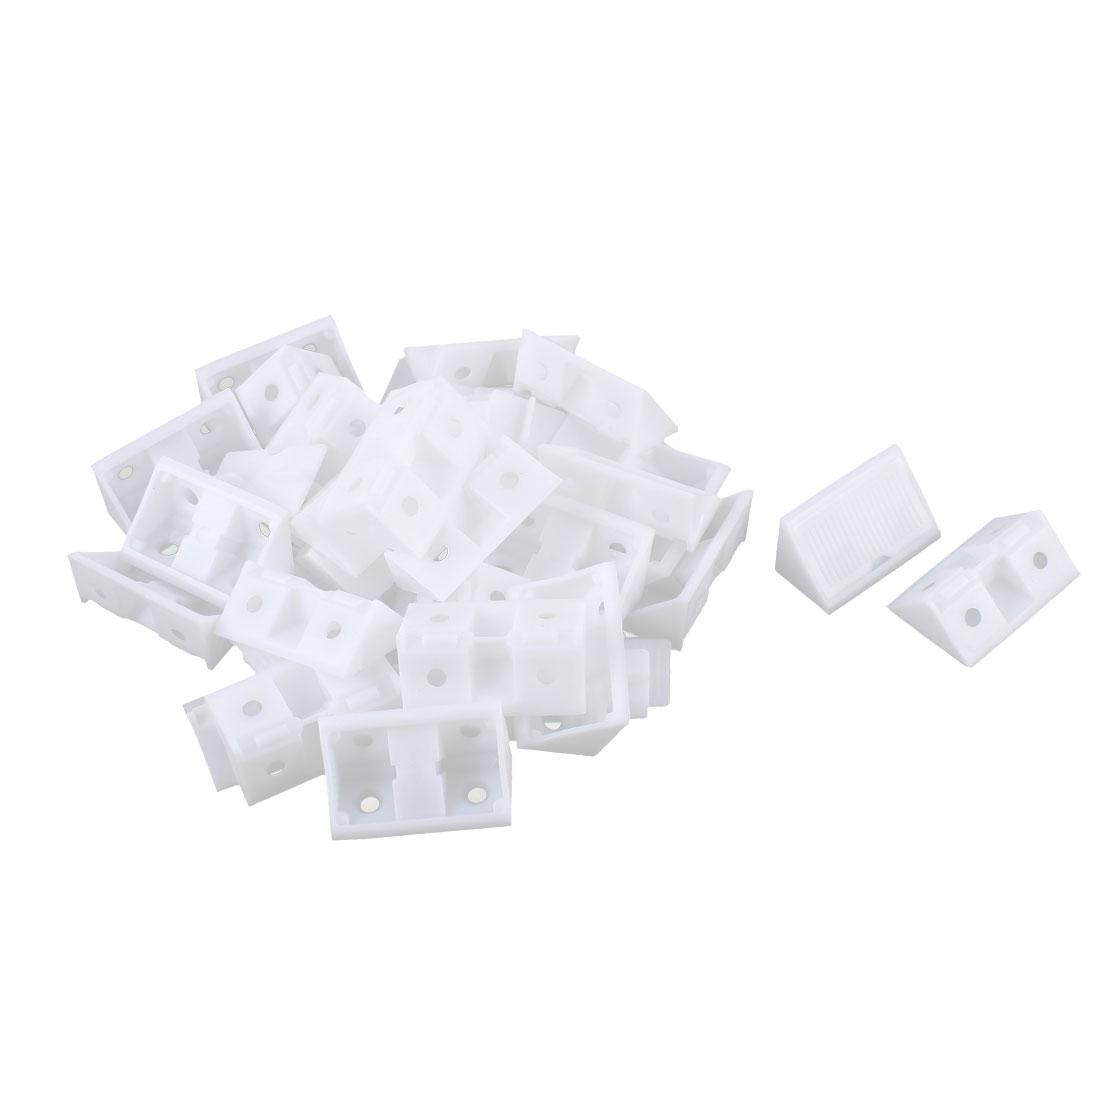 Furniture Cabinet Plastic 90 Degree Angle Brackets White 25pcs